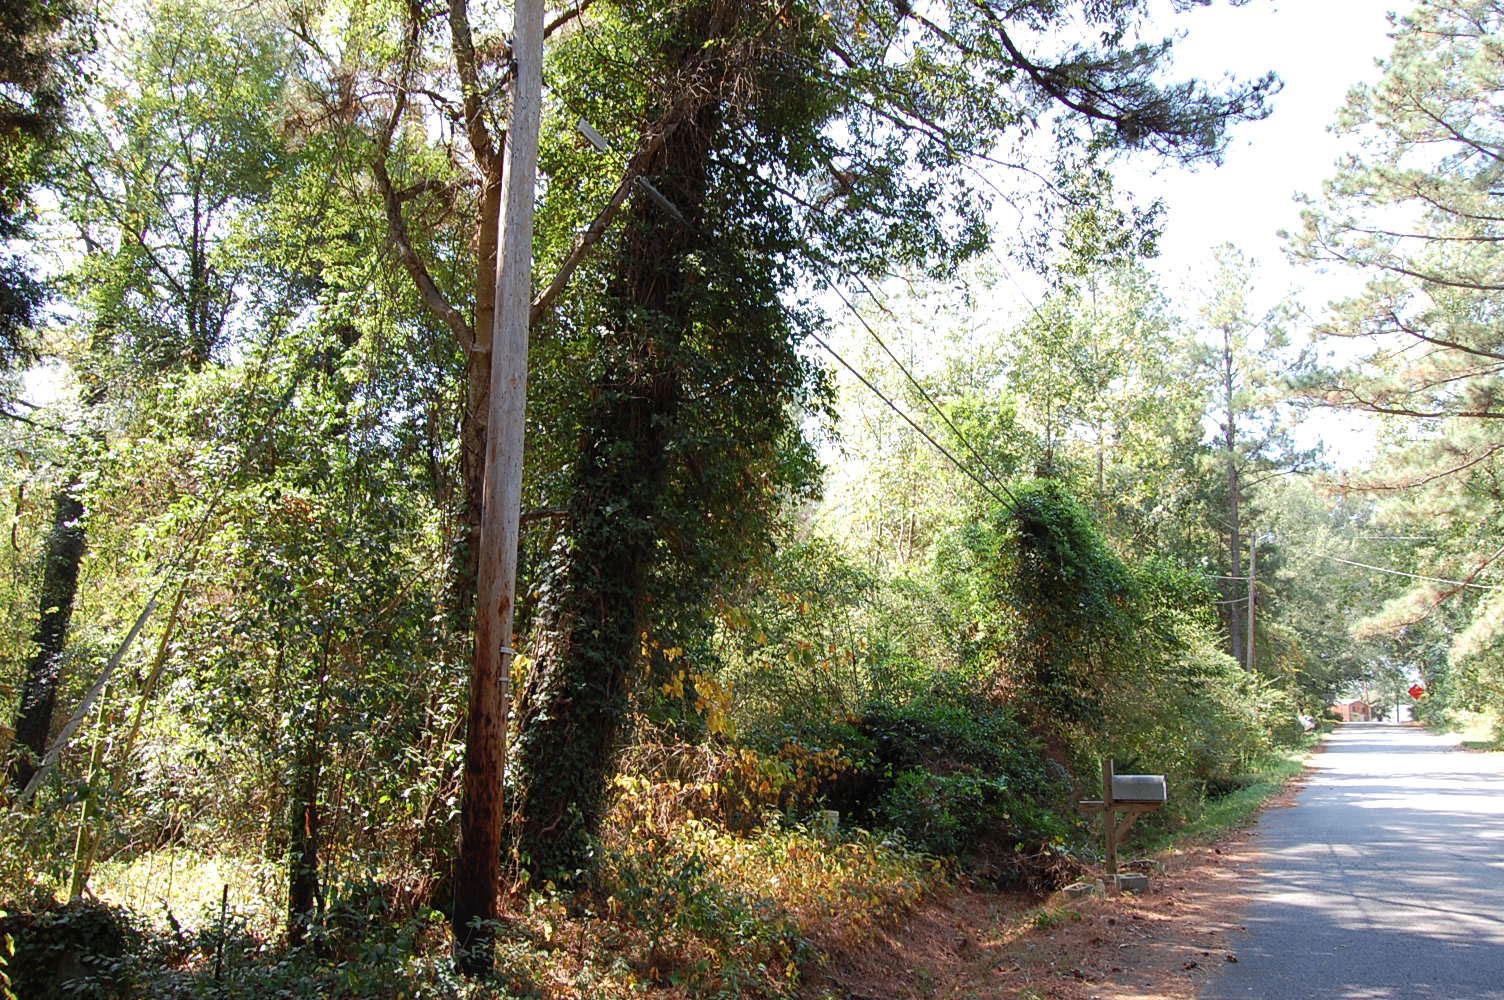 Columbia South Carolina Suburb Property - Image 1